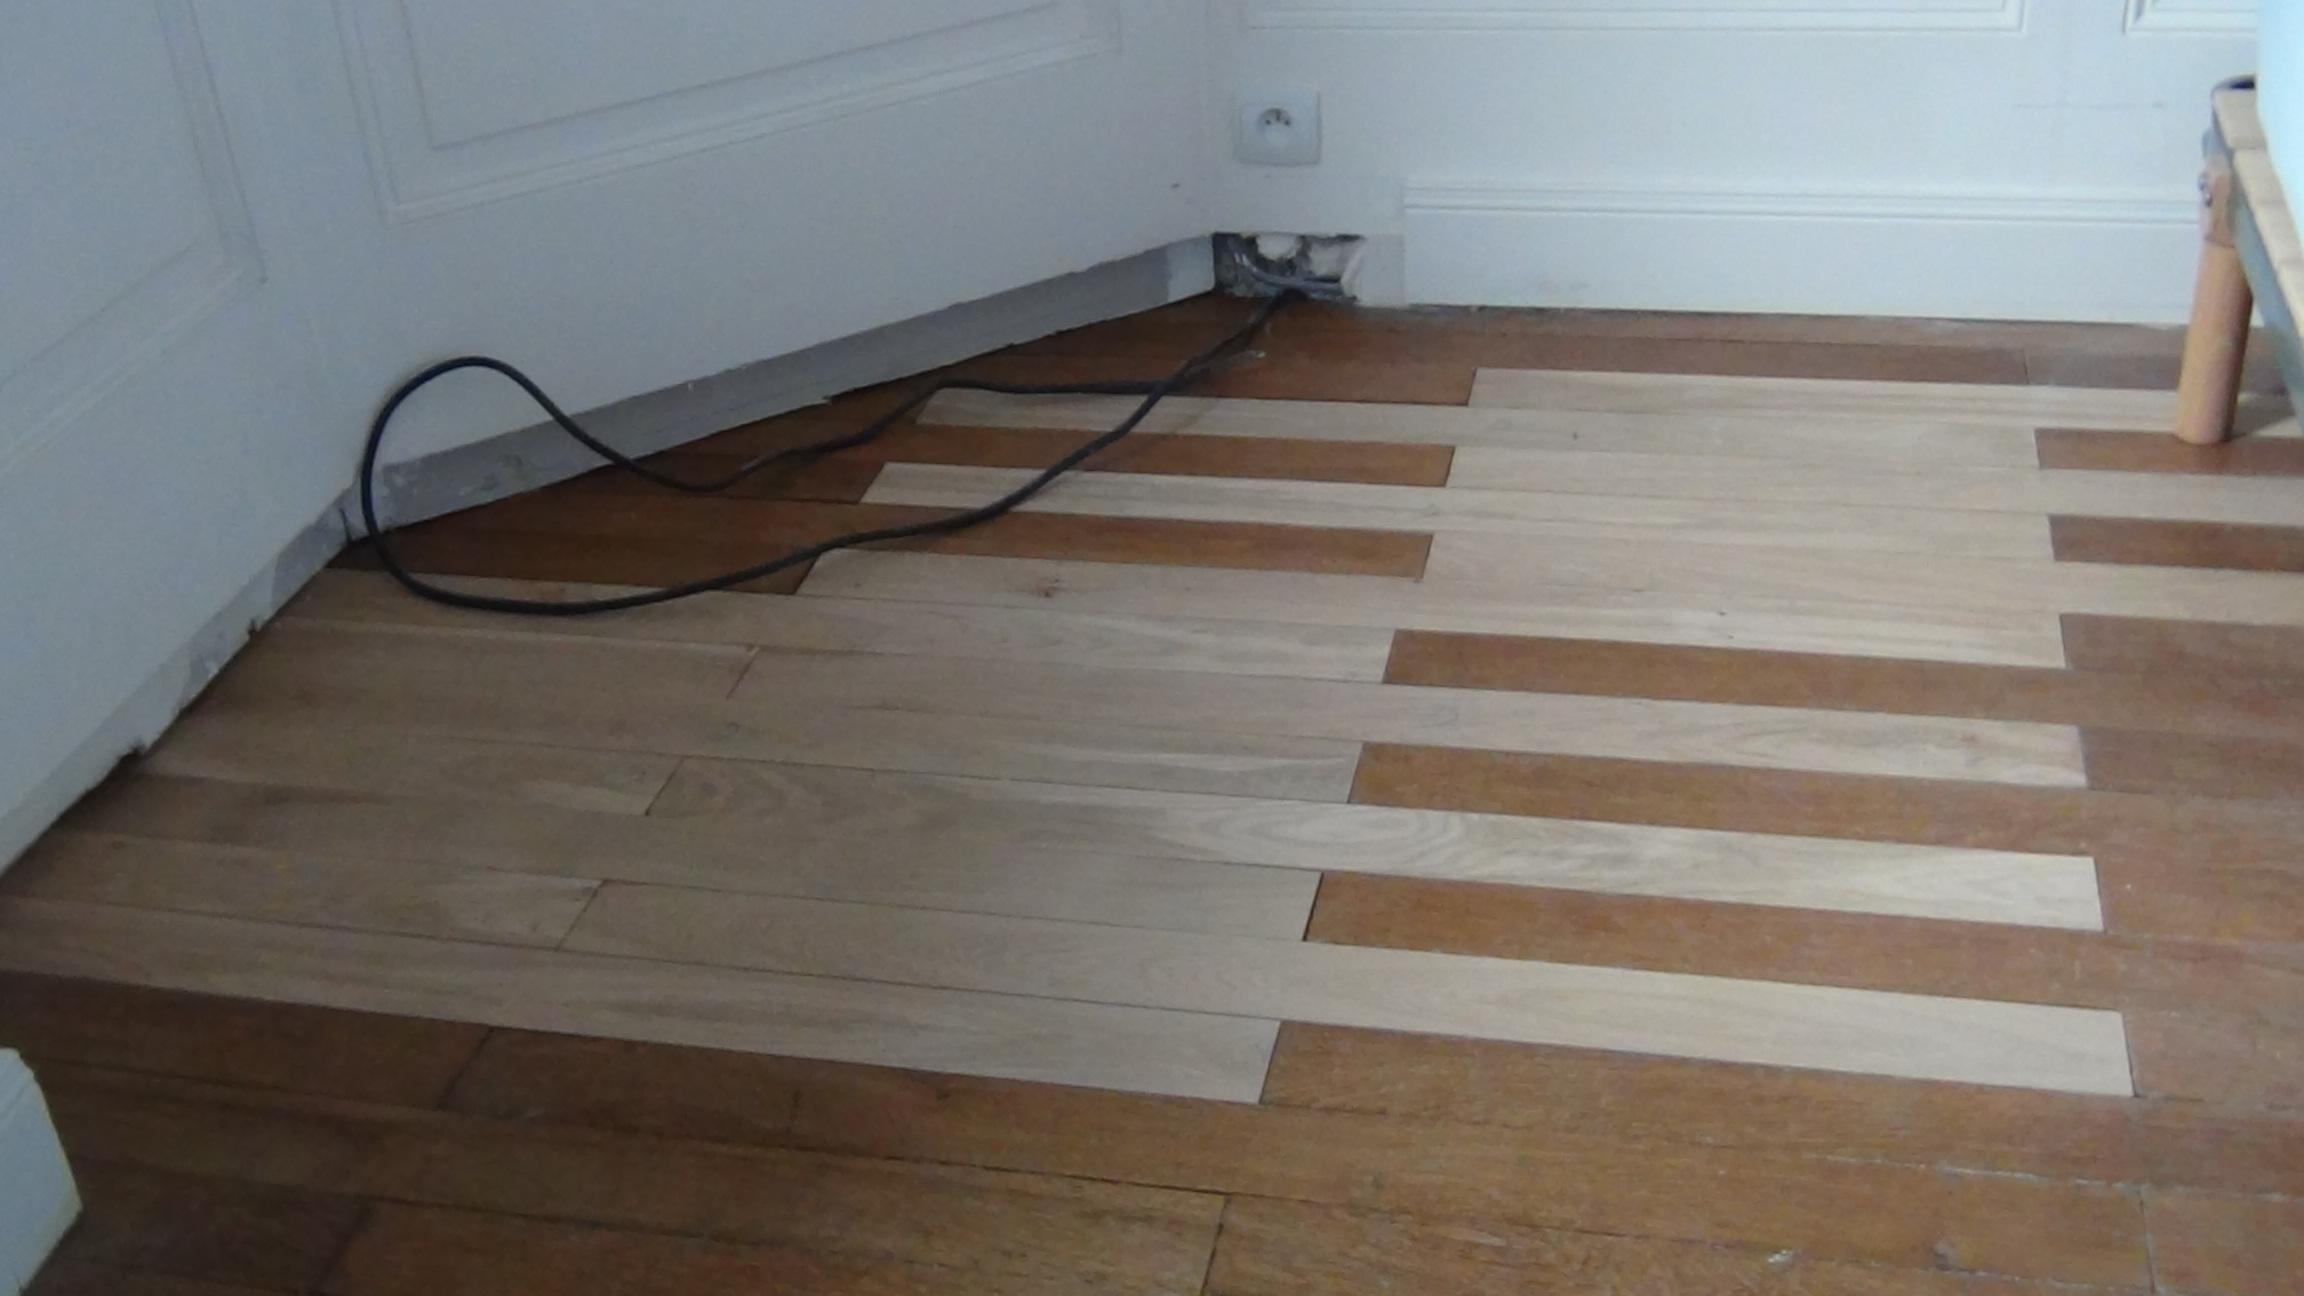 refabrication de parquet ch ne r novation de plancher refabrication de plancher ch ne. Black Bedroom Furniture Sets. Home Design Ideas